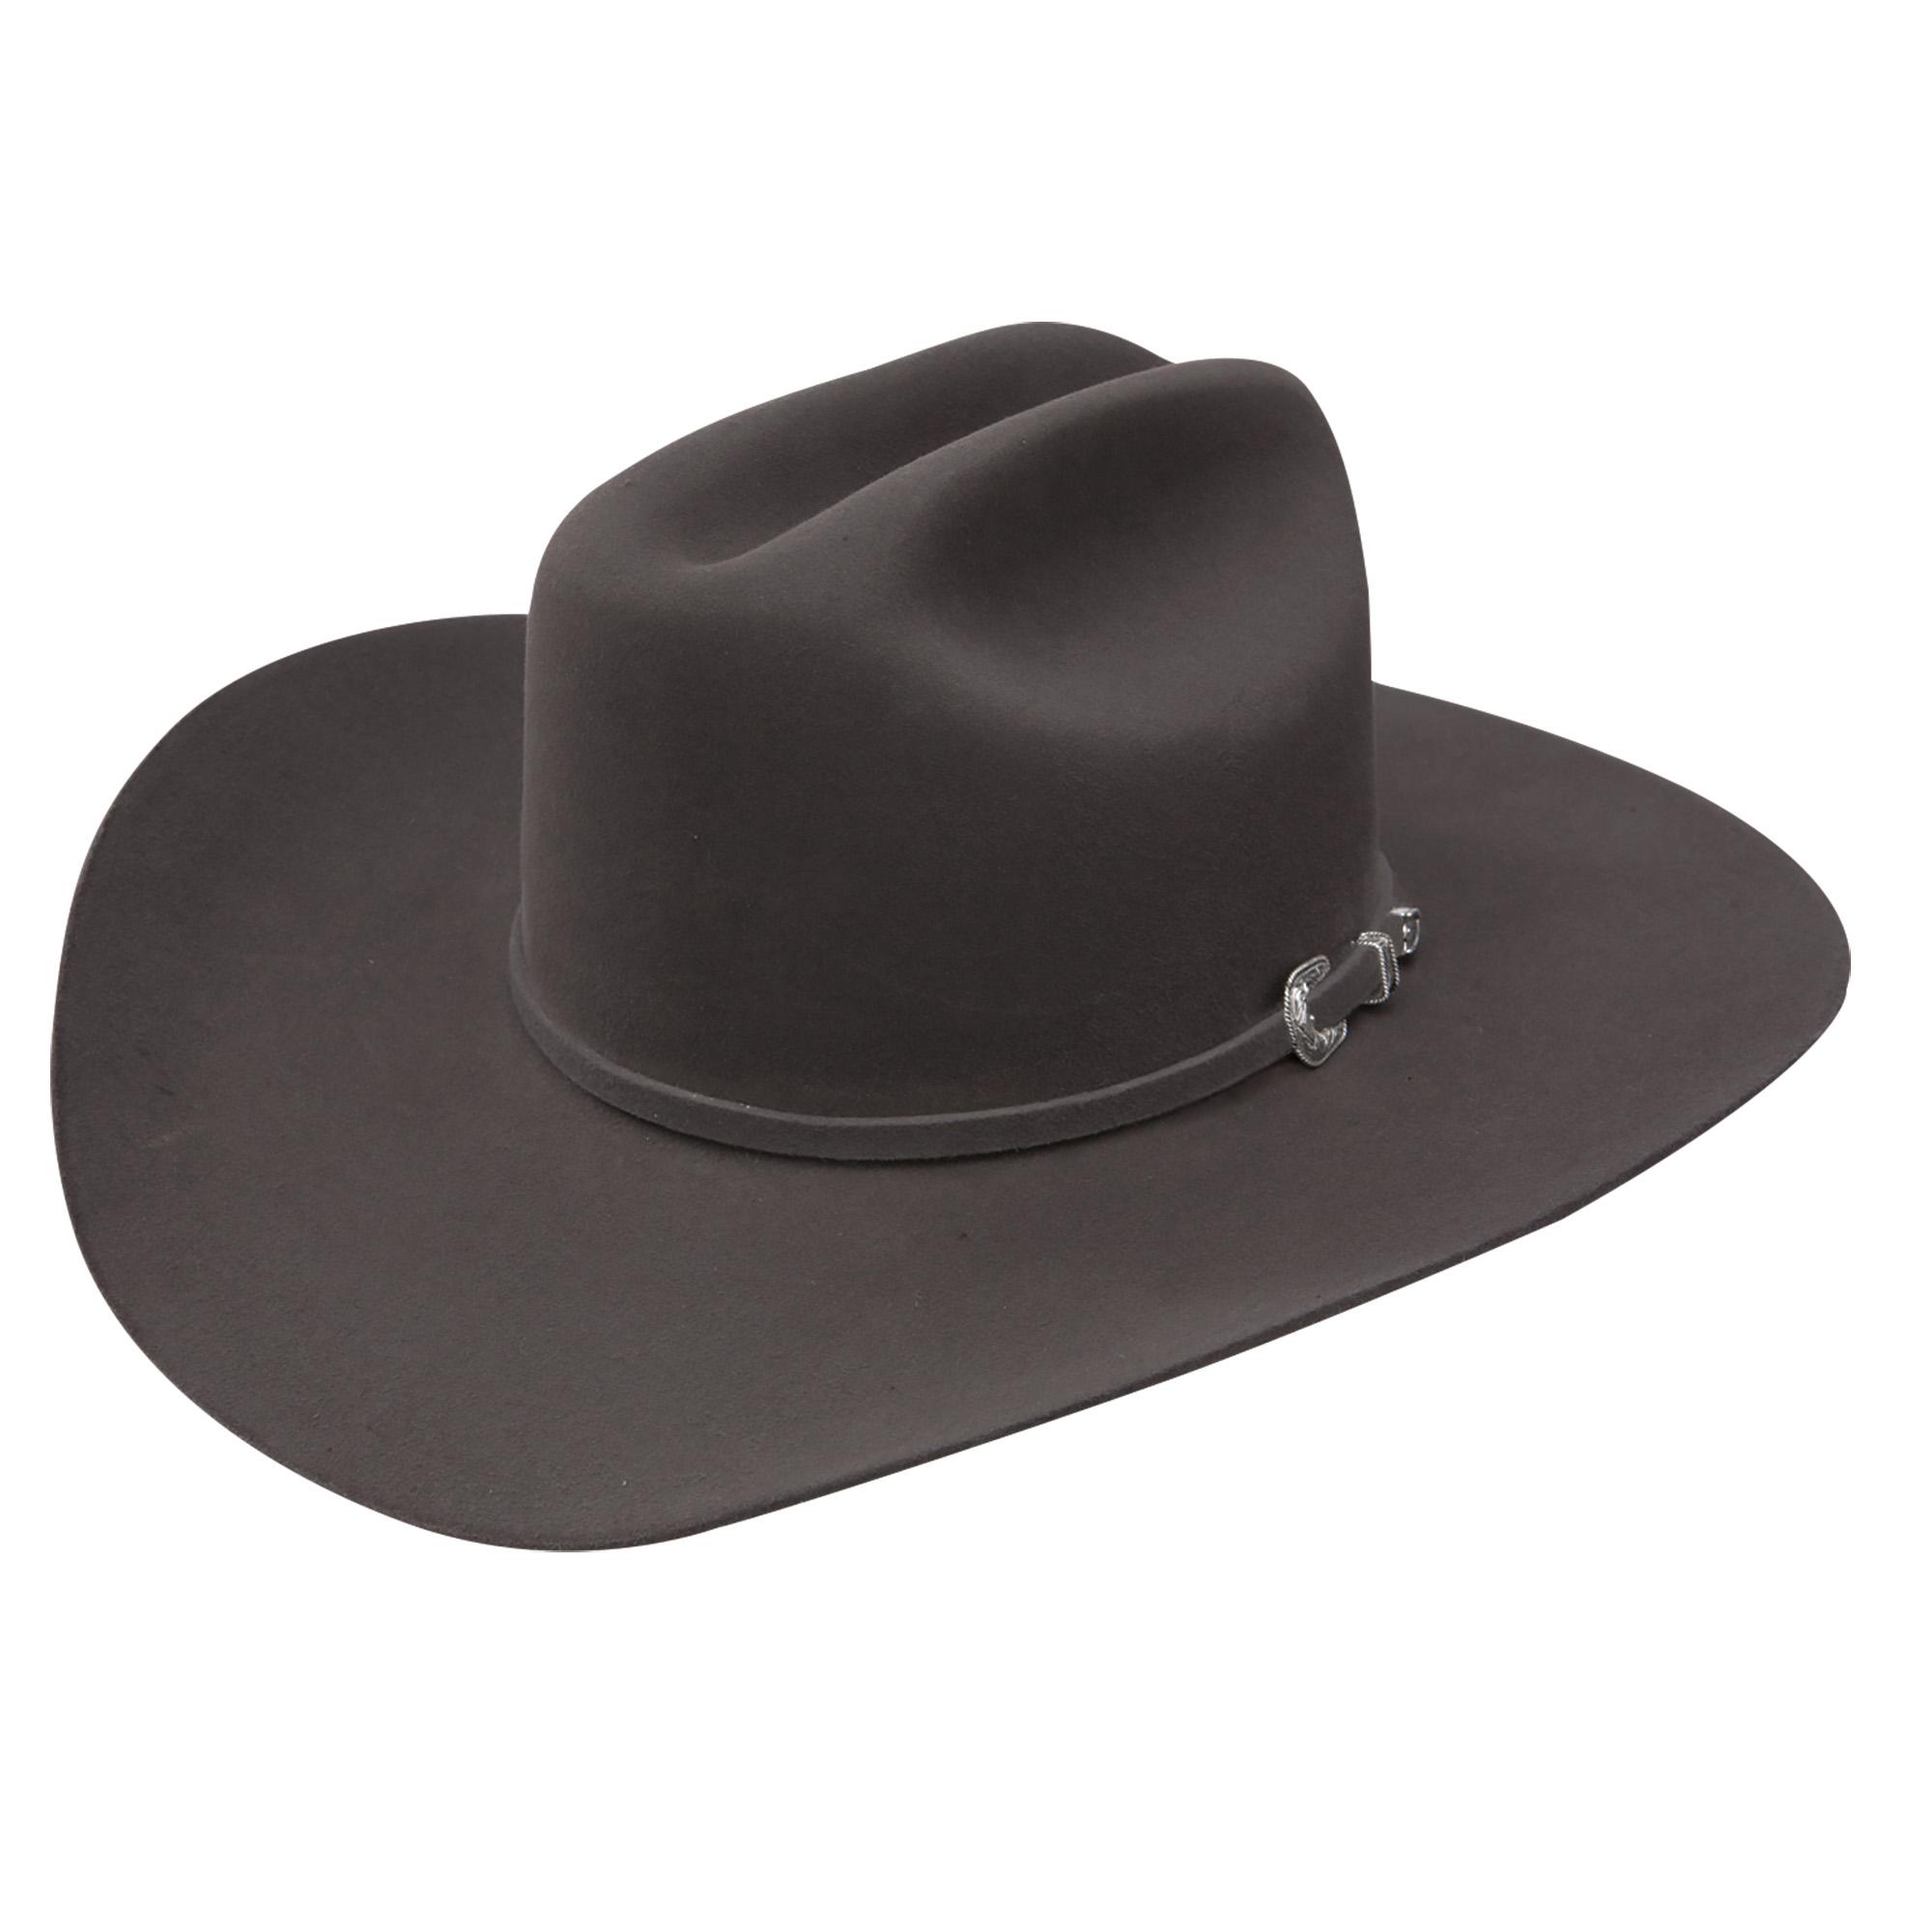 6e3a96f234f Resistol Tarrant 20X Felt Hat. Tap to expand